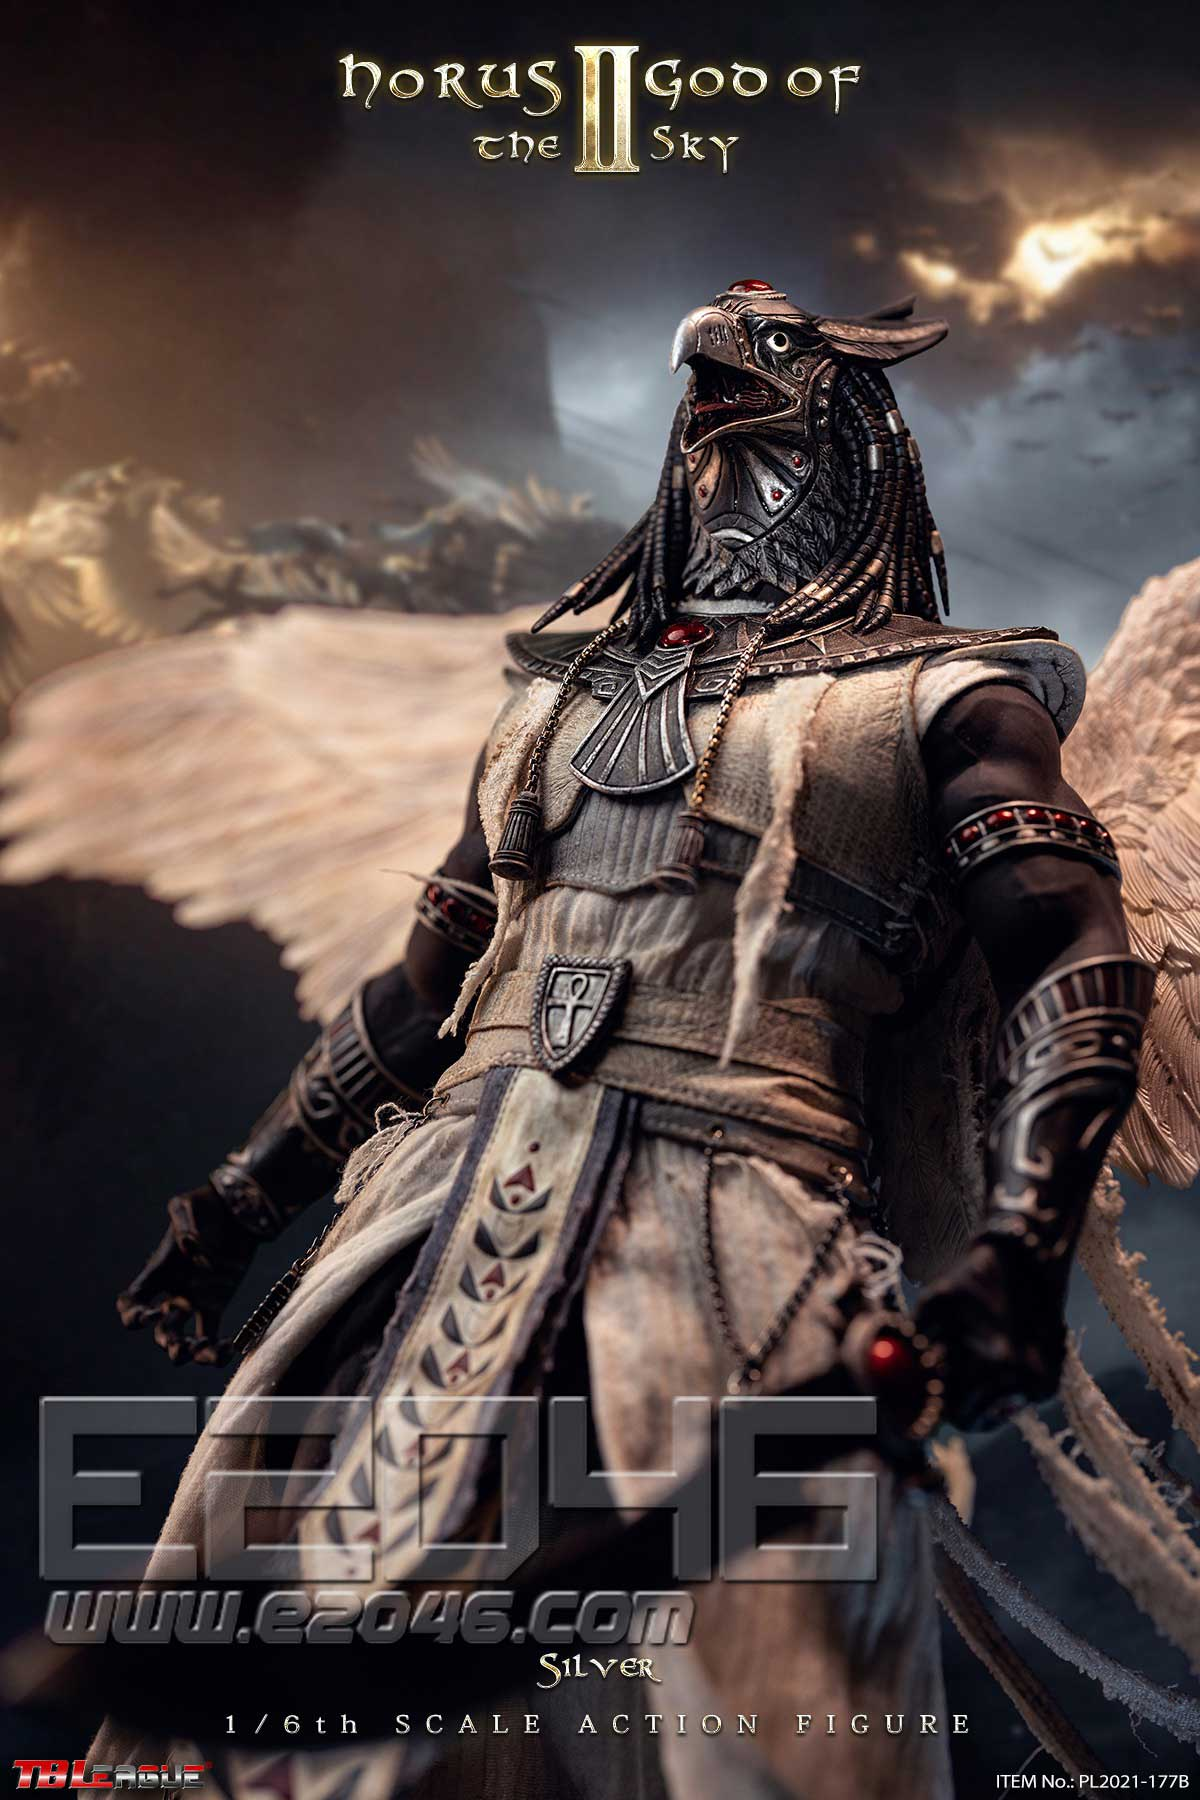 God Of Sky Horus B (DOLL)